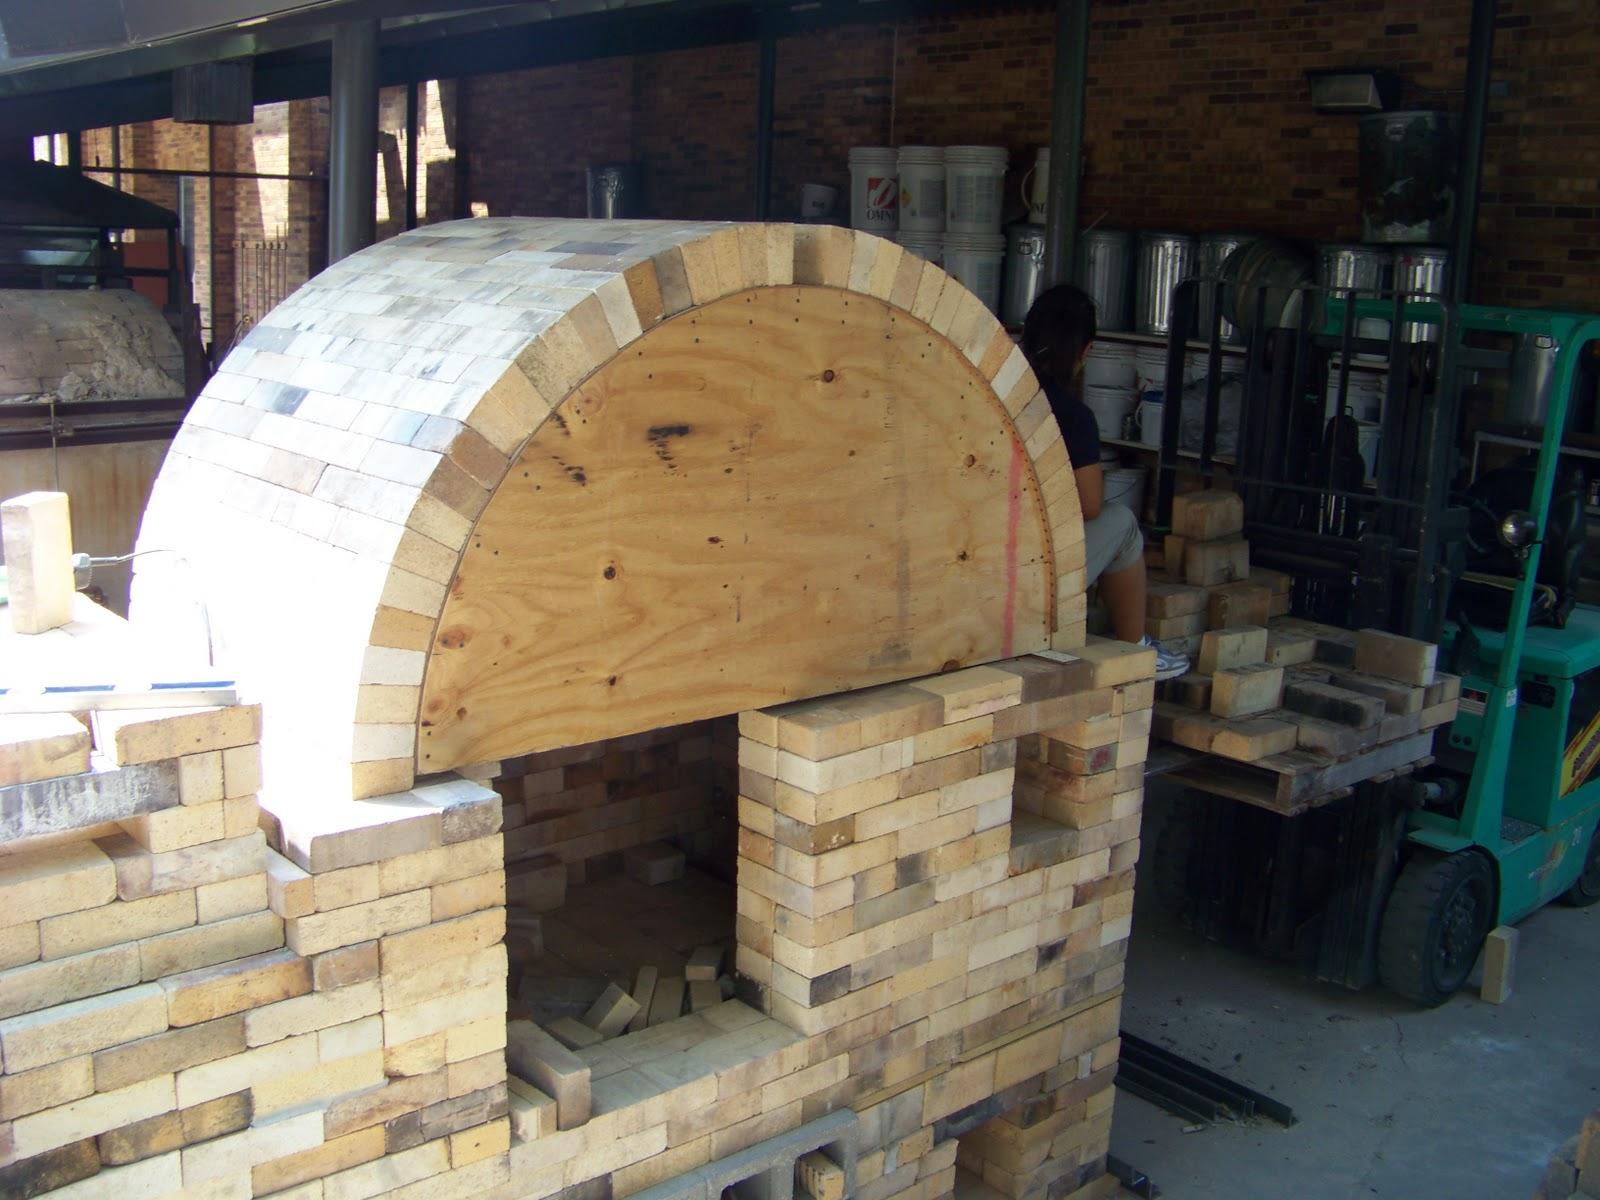 Cmu 442 Kiln Construction Jake Allee Wood Fired Cross